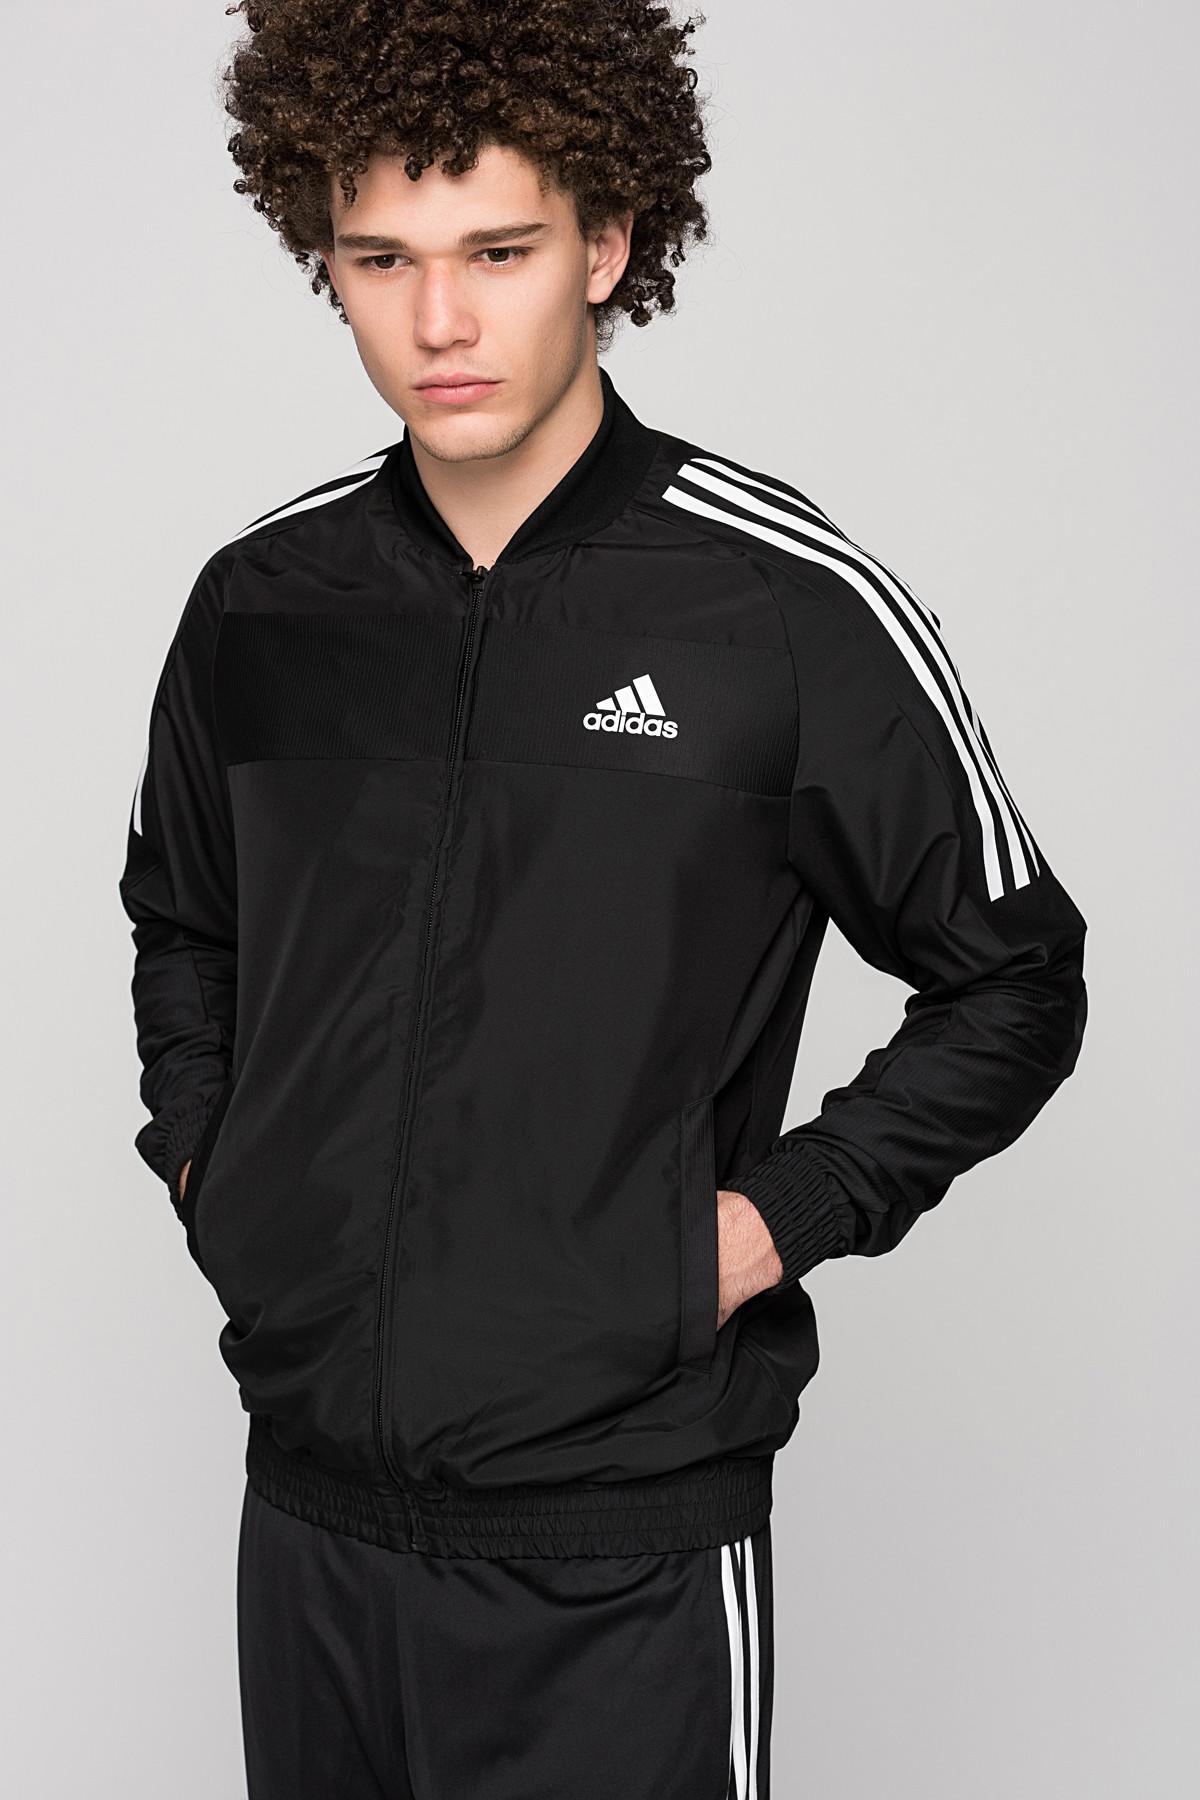 Erkek Sweatshirt - Club Jacket - B45845